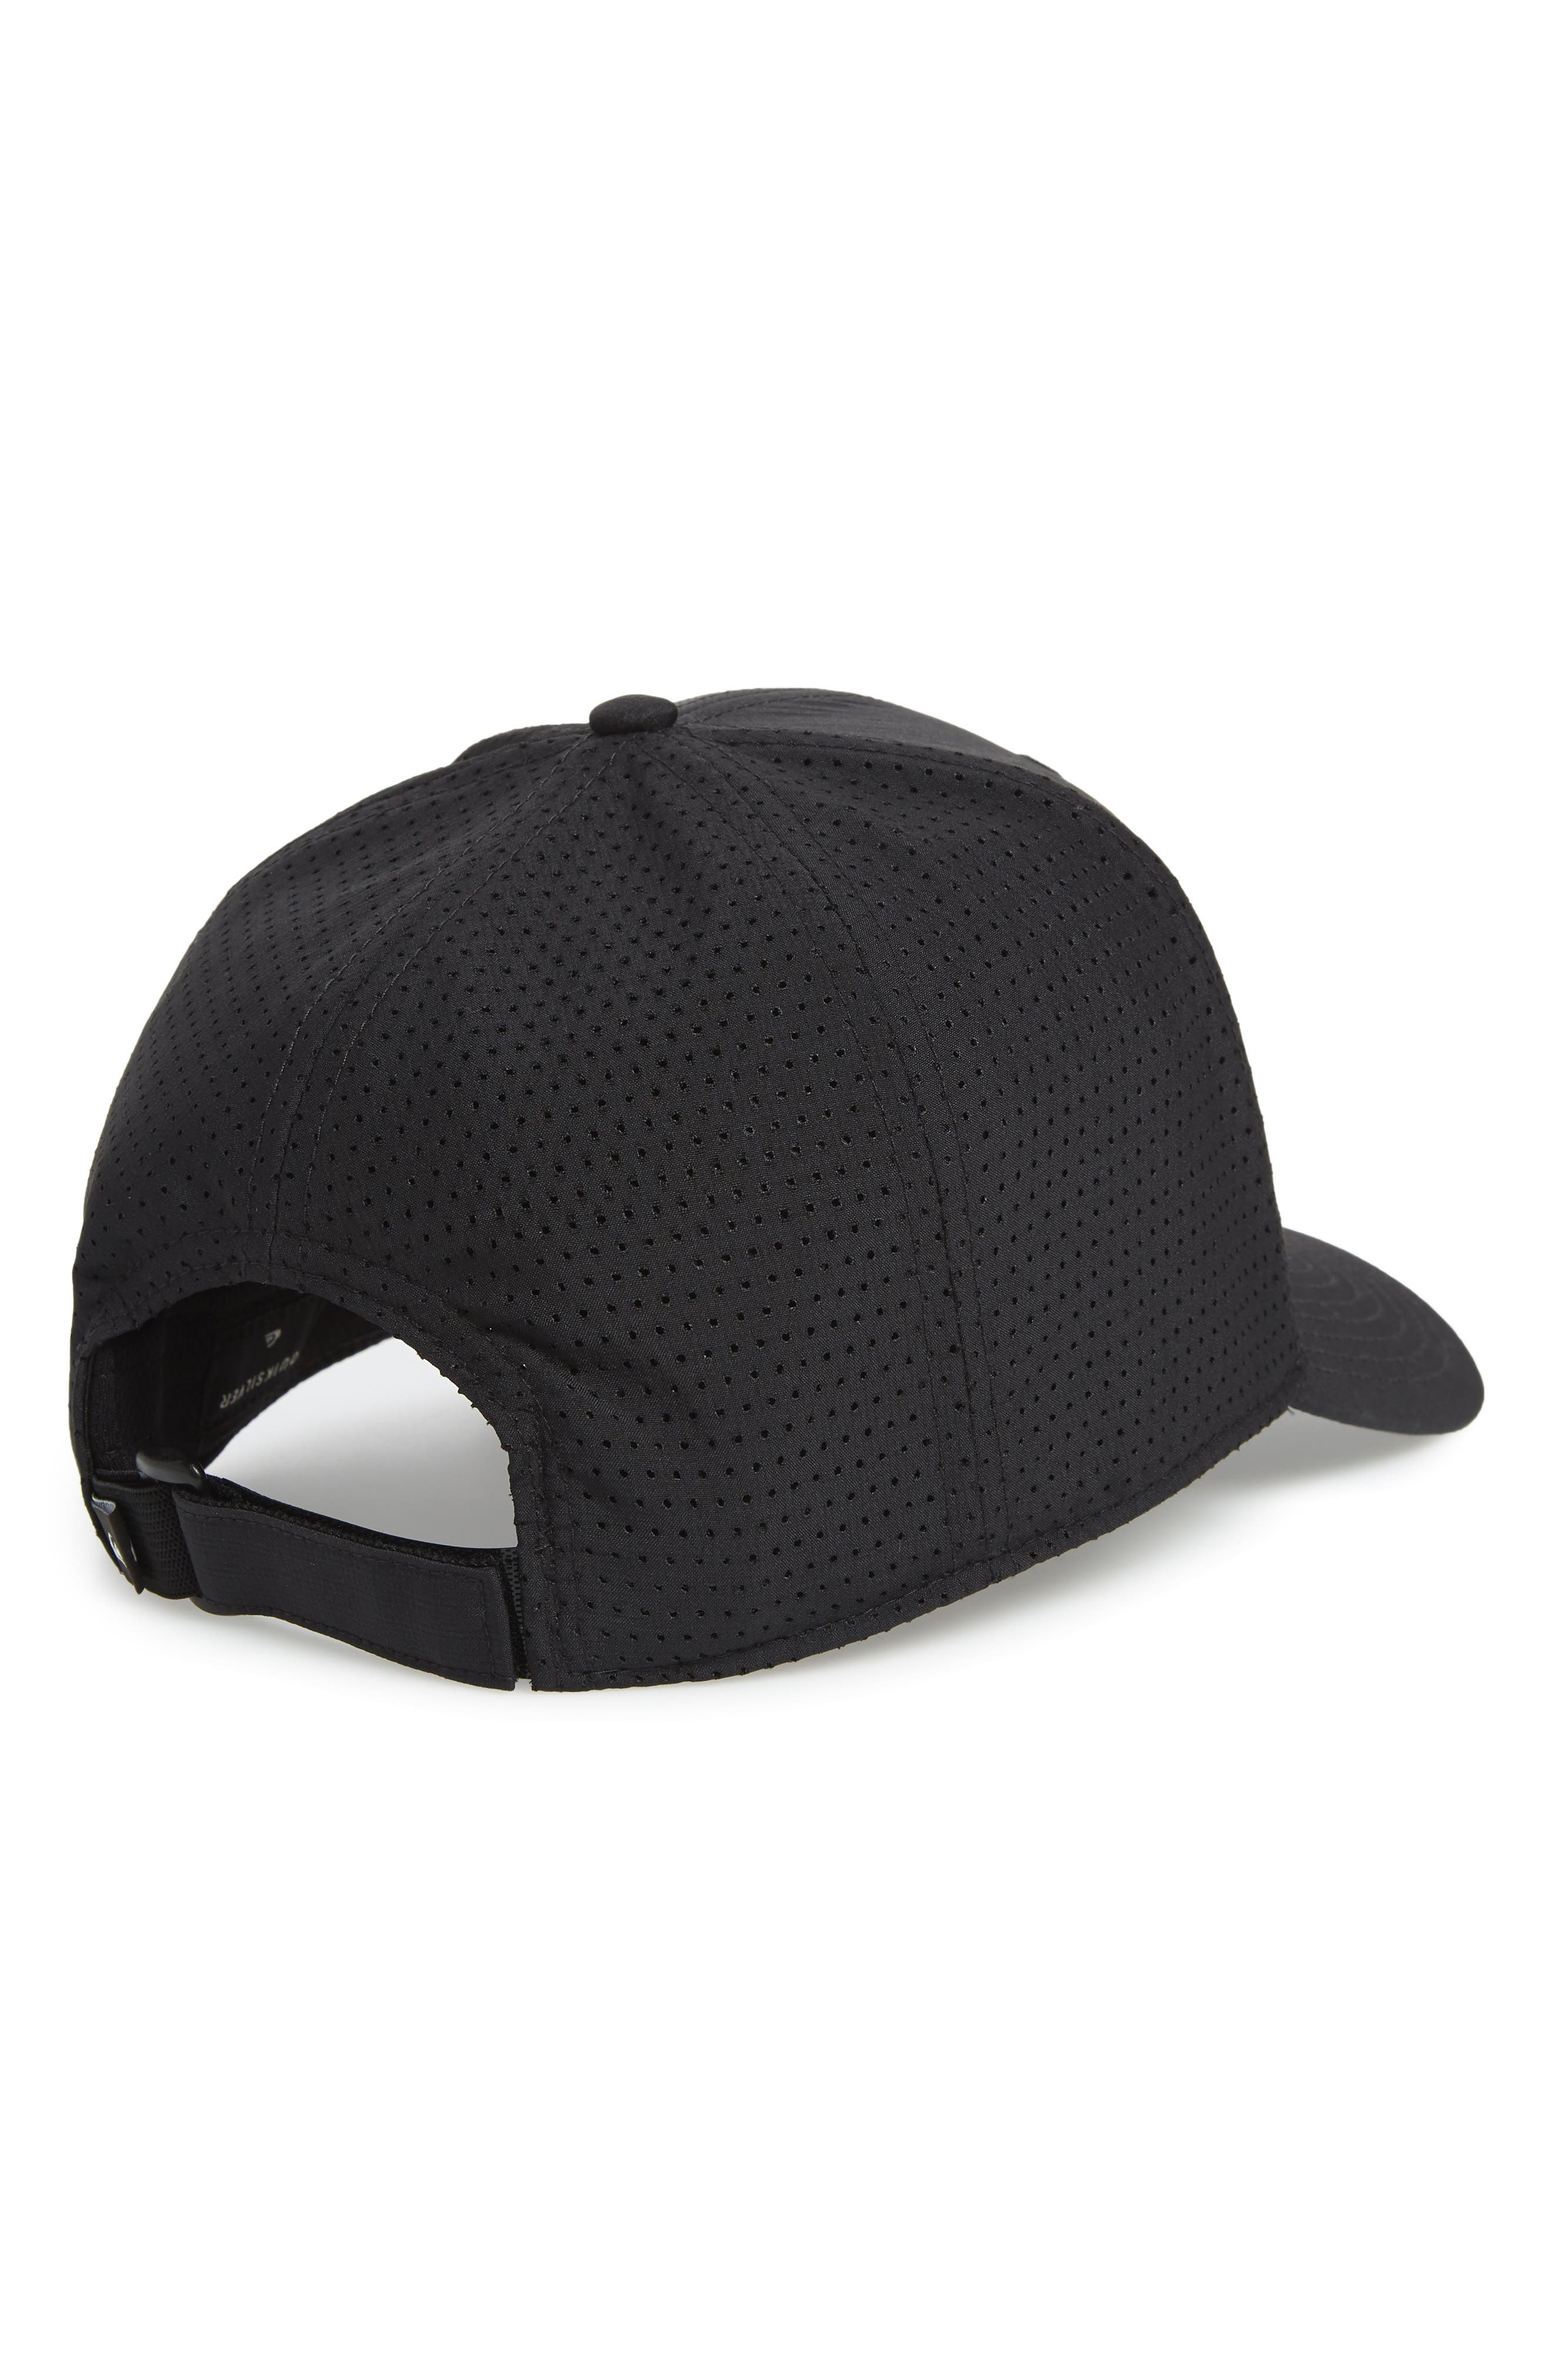 Technabutter 2 Baseball Cap,                             Alternate thumbnail 2, color,                             BLACK